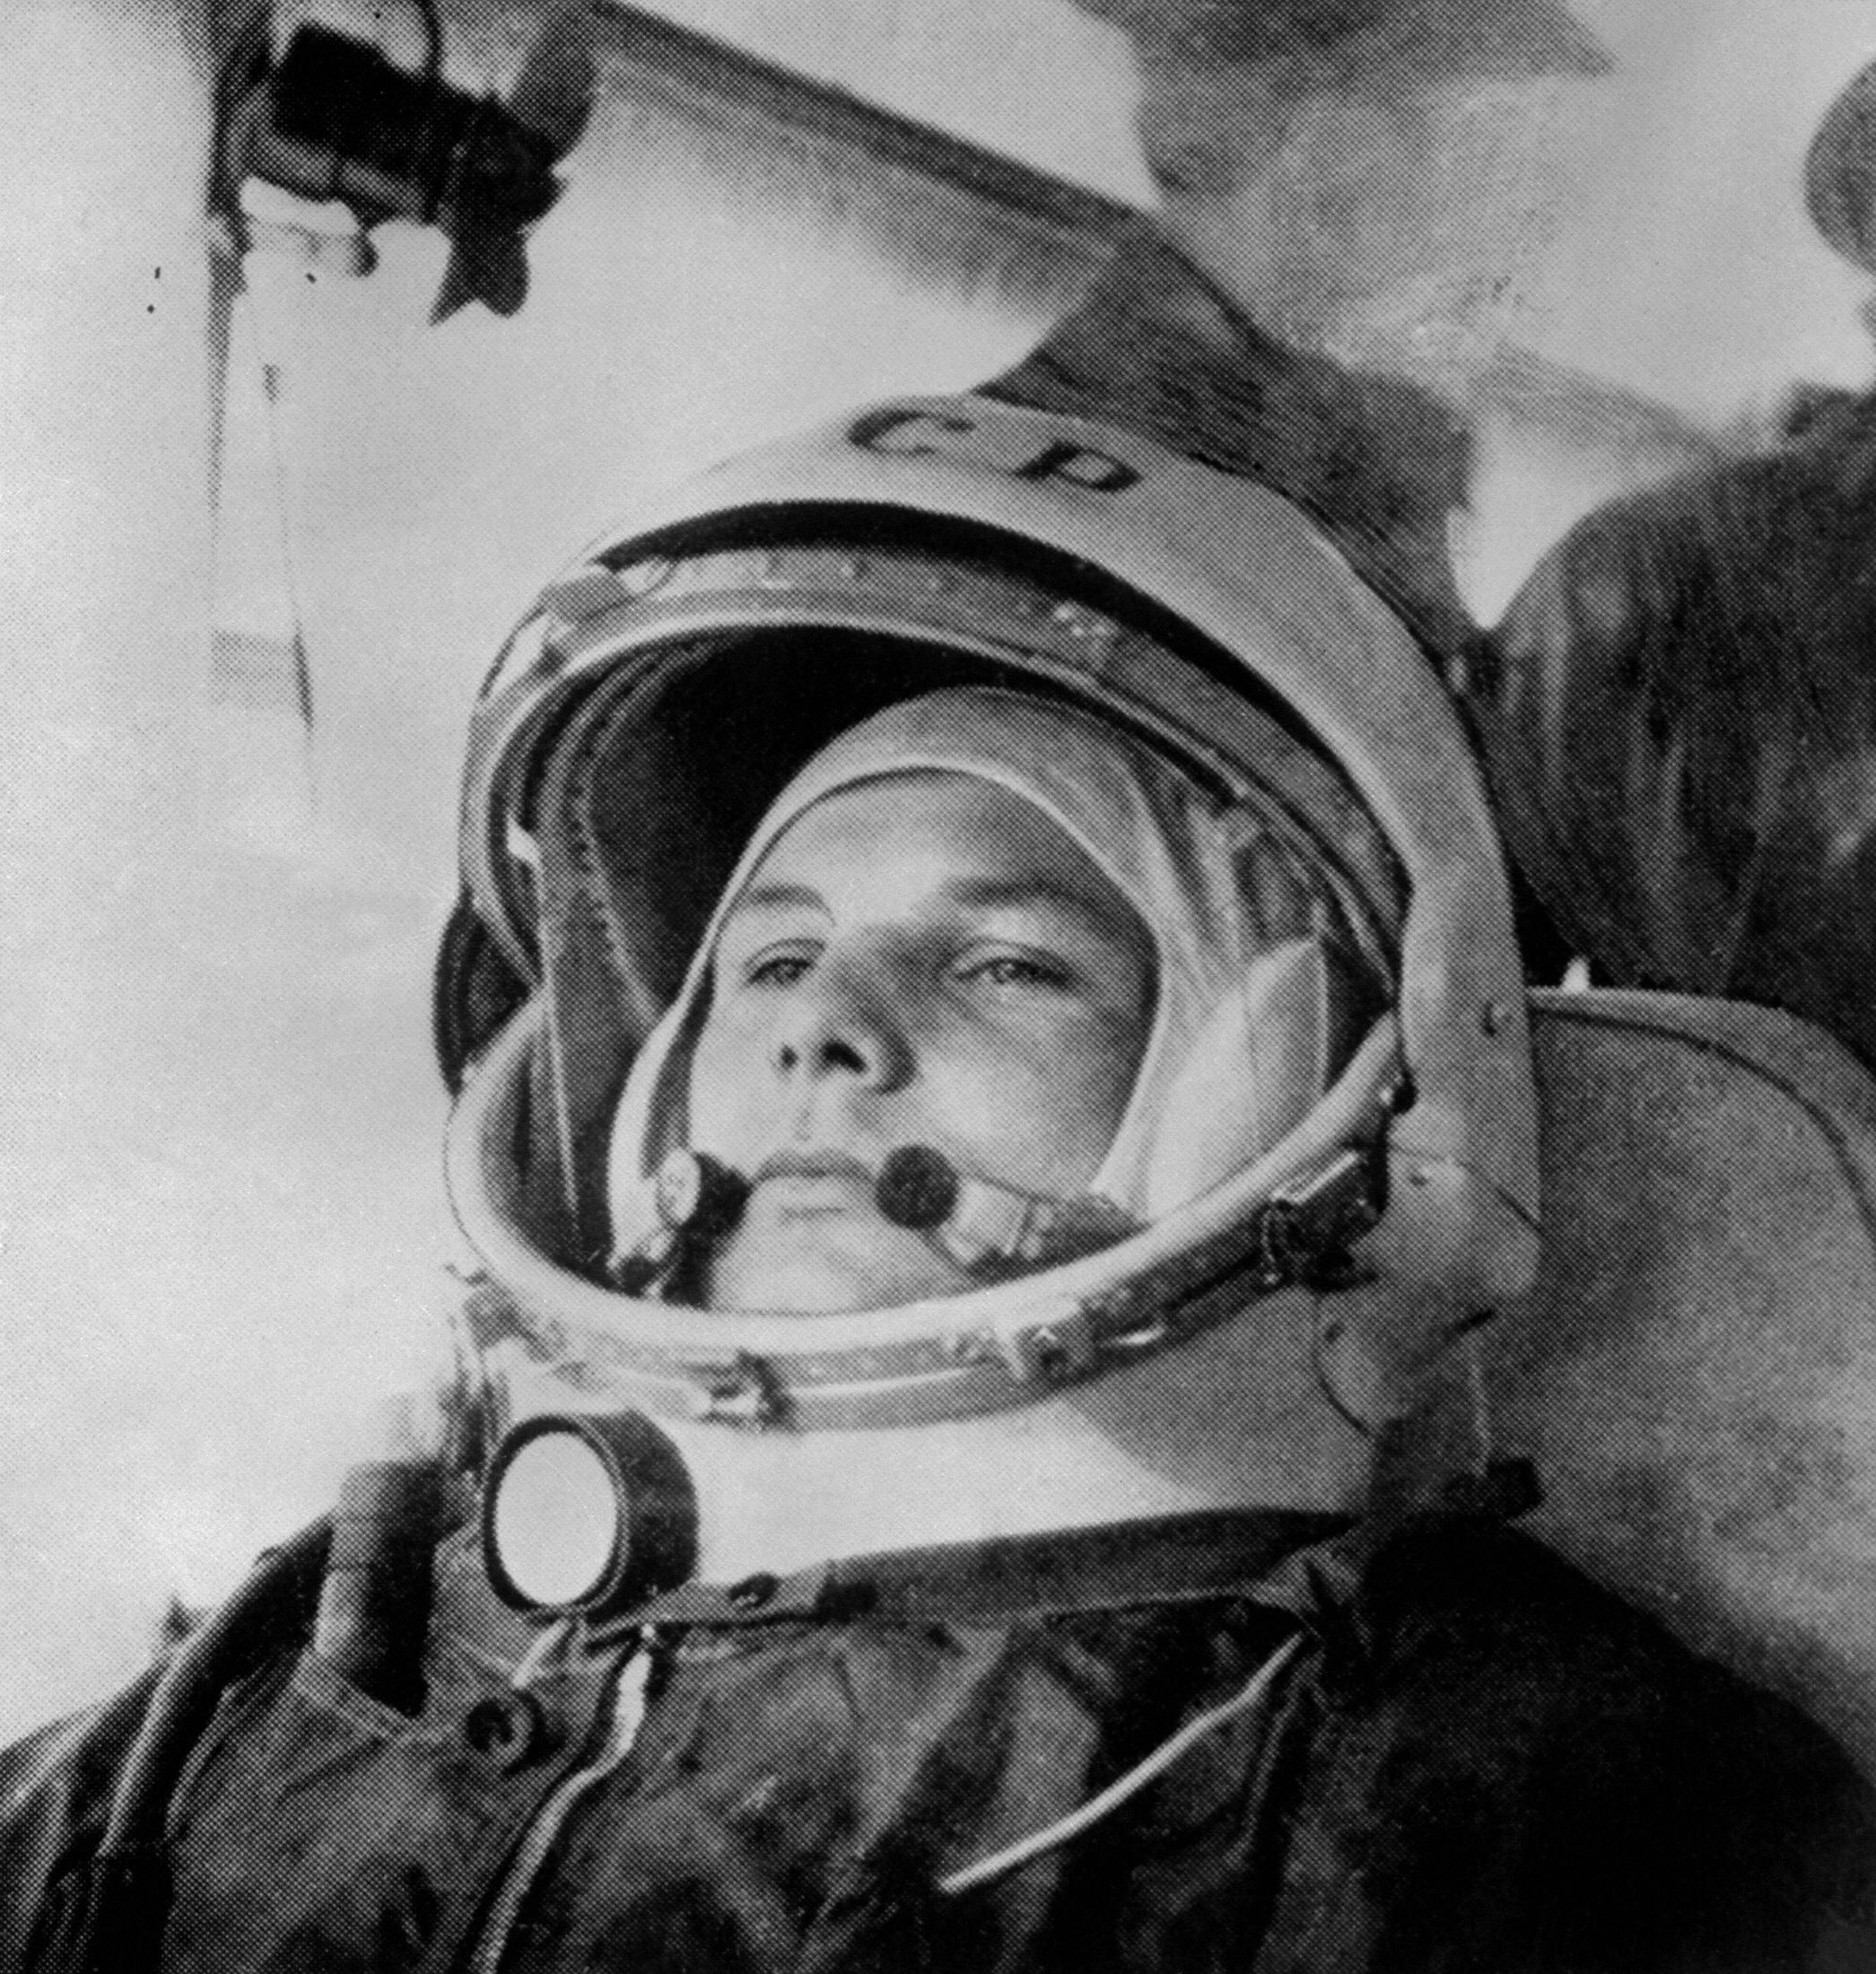 Yuri Gagarin, 12 April 1961